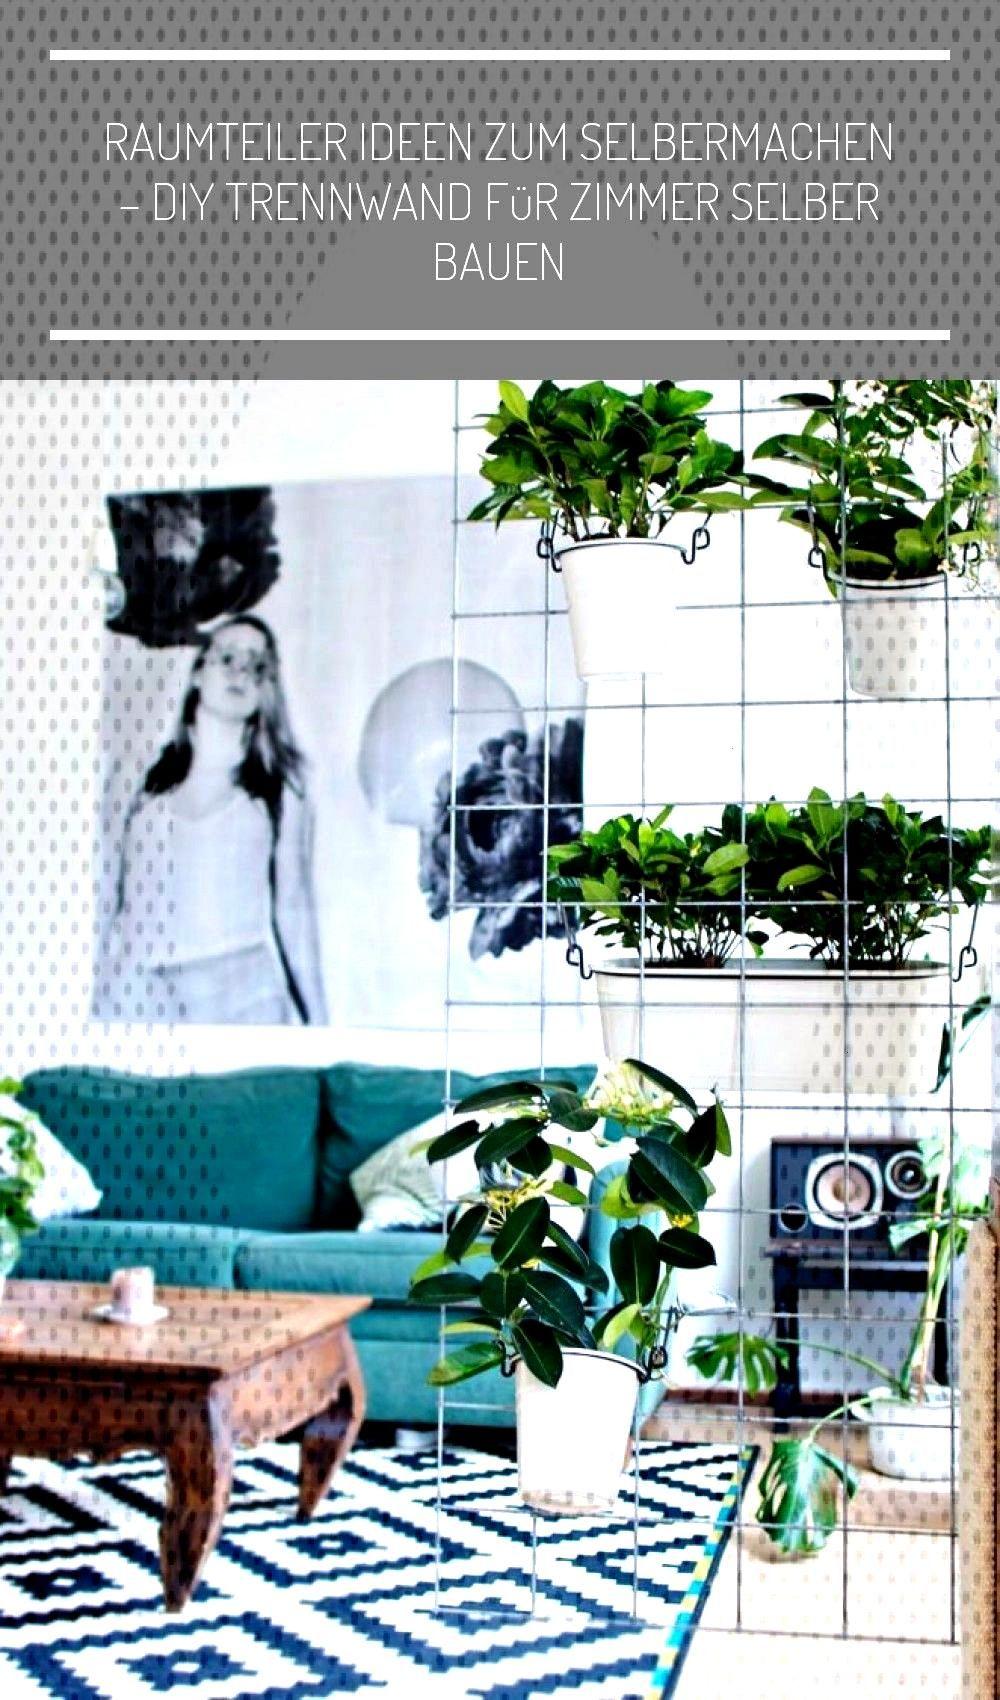 Trennwandraumtrenner Raumteilervorhang Innenarchitektur Avecraumtrenner Zimmerpflanzen Ankleidezi Plant Decor Indoor Plants Indoor Apartment Indoor Decor